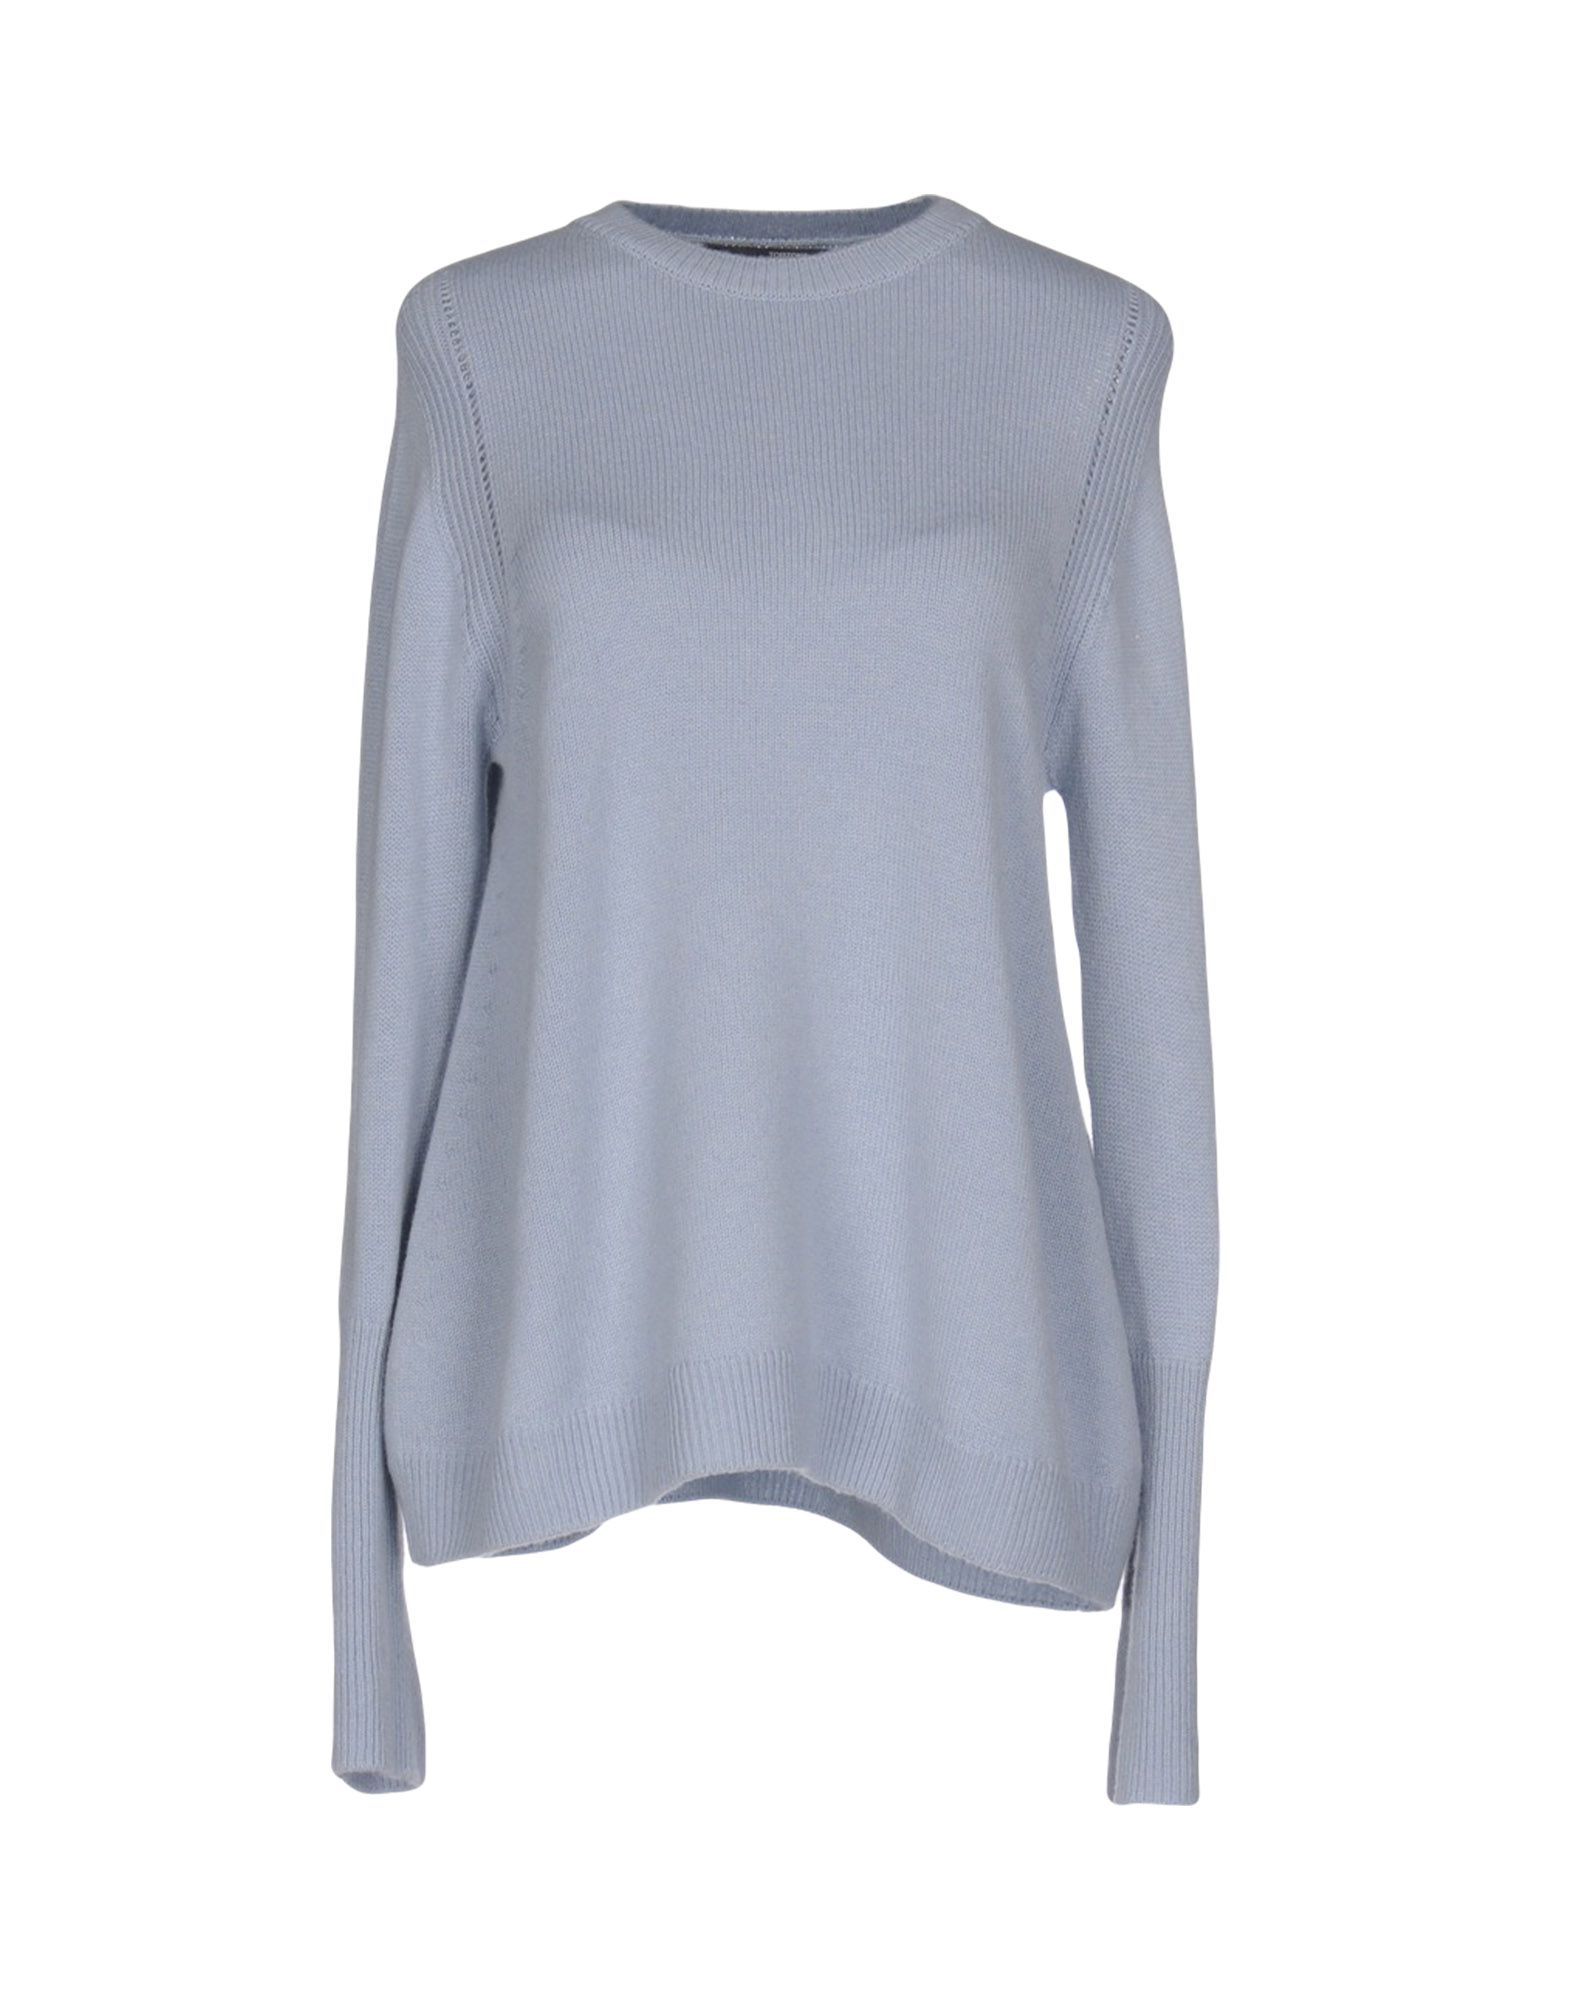 TORTONA 21 Damen Pullover Farbe Himmelblau Größe 5 - broschei